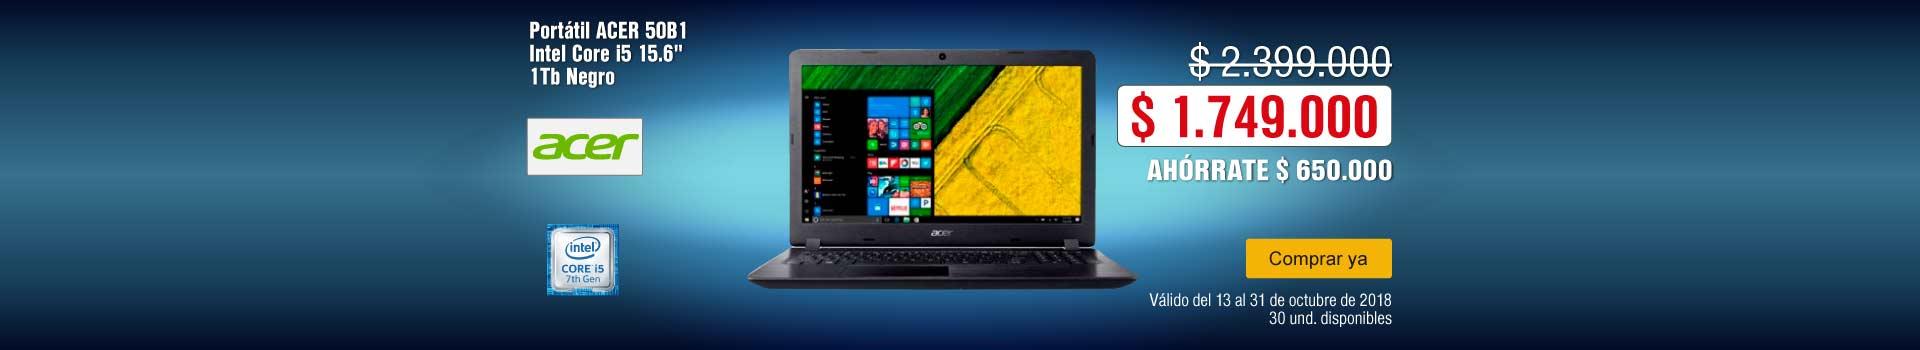 KT-BCAT-4-computadores y tablets-PP---Acer-Portátil 50B1-Oct17